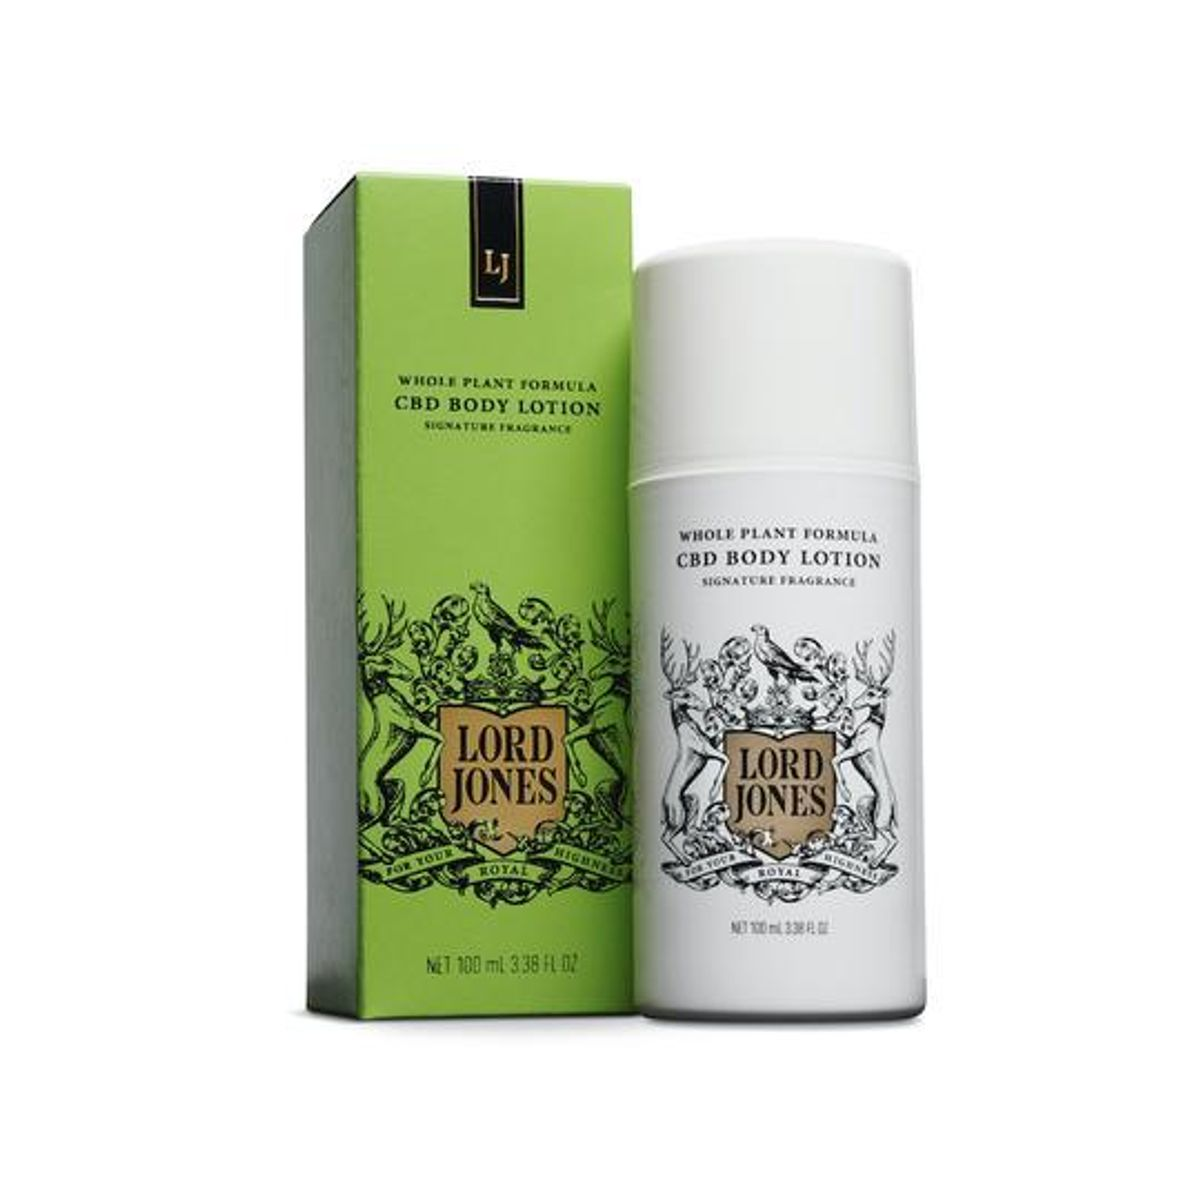 lord jones cbd body lotion